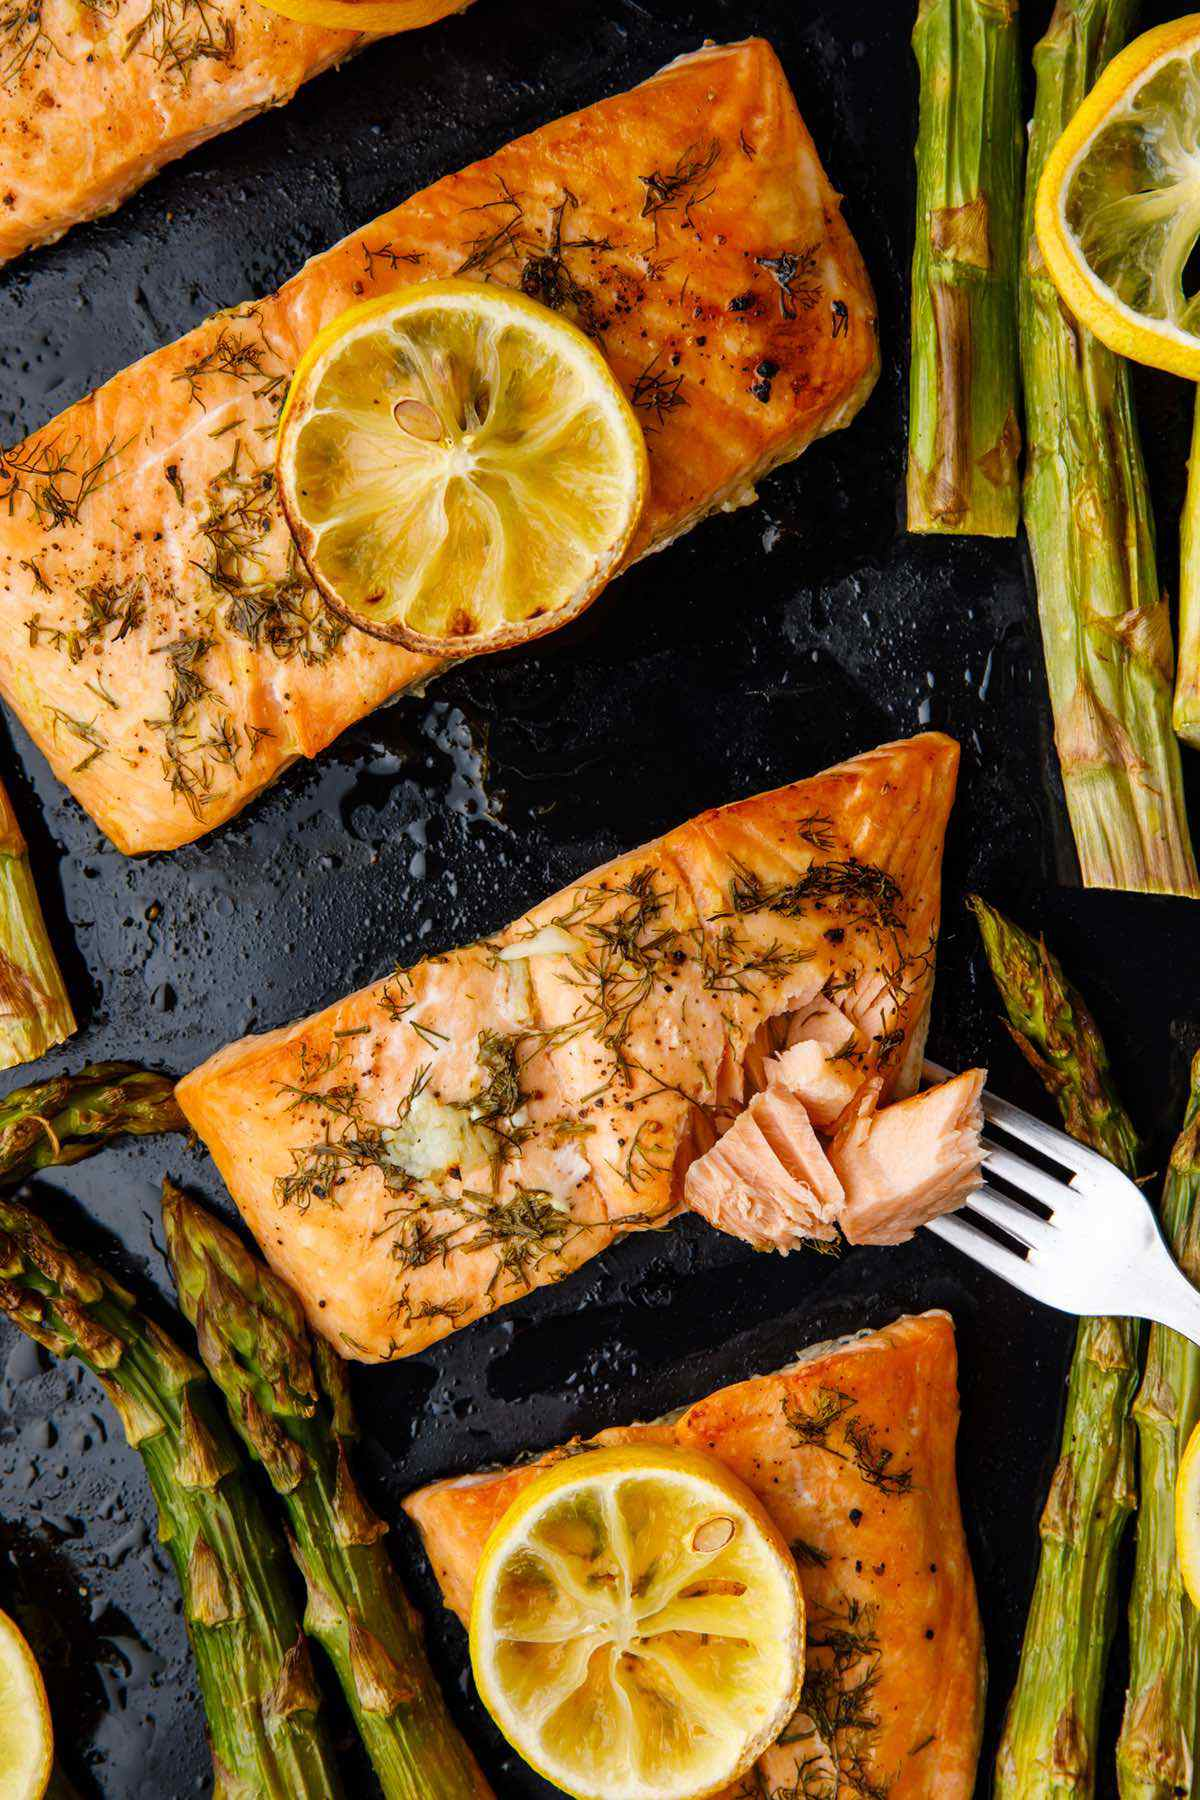 baked salmon dish